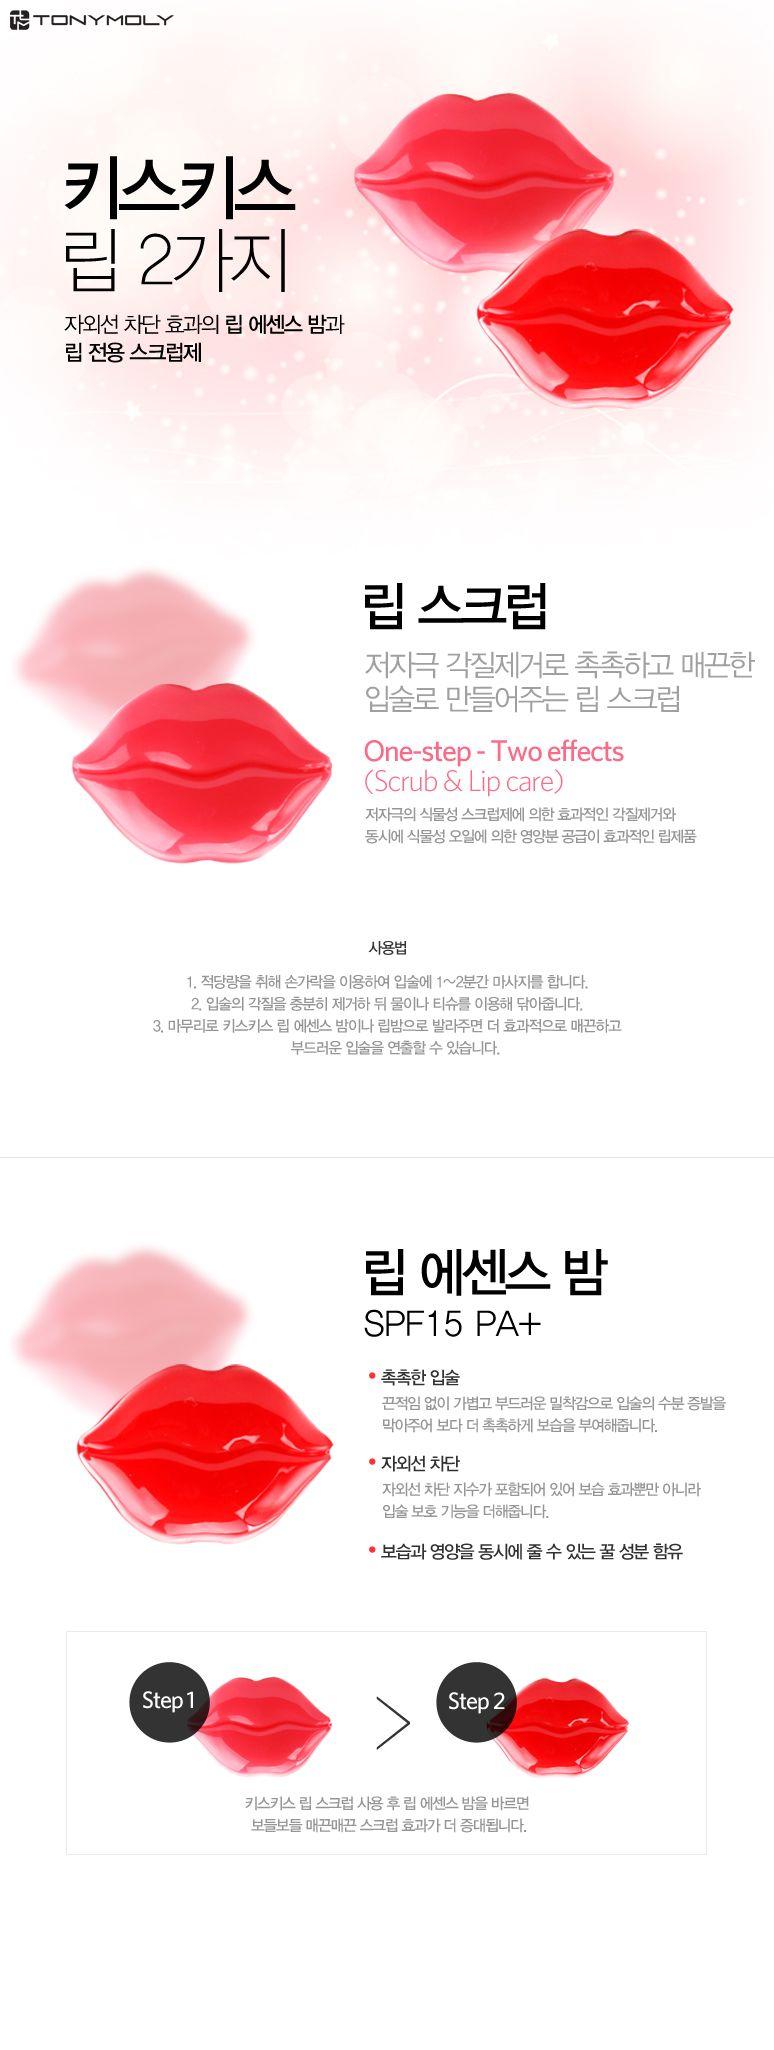 Tony Moly Kiss Kiss Lip The Cutest Makeup (con imágenes